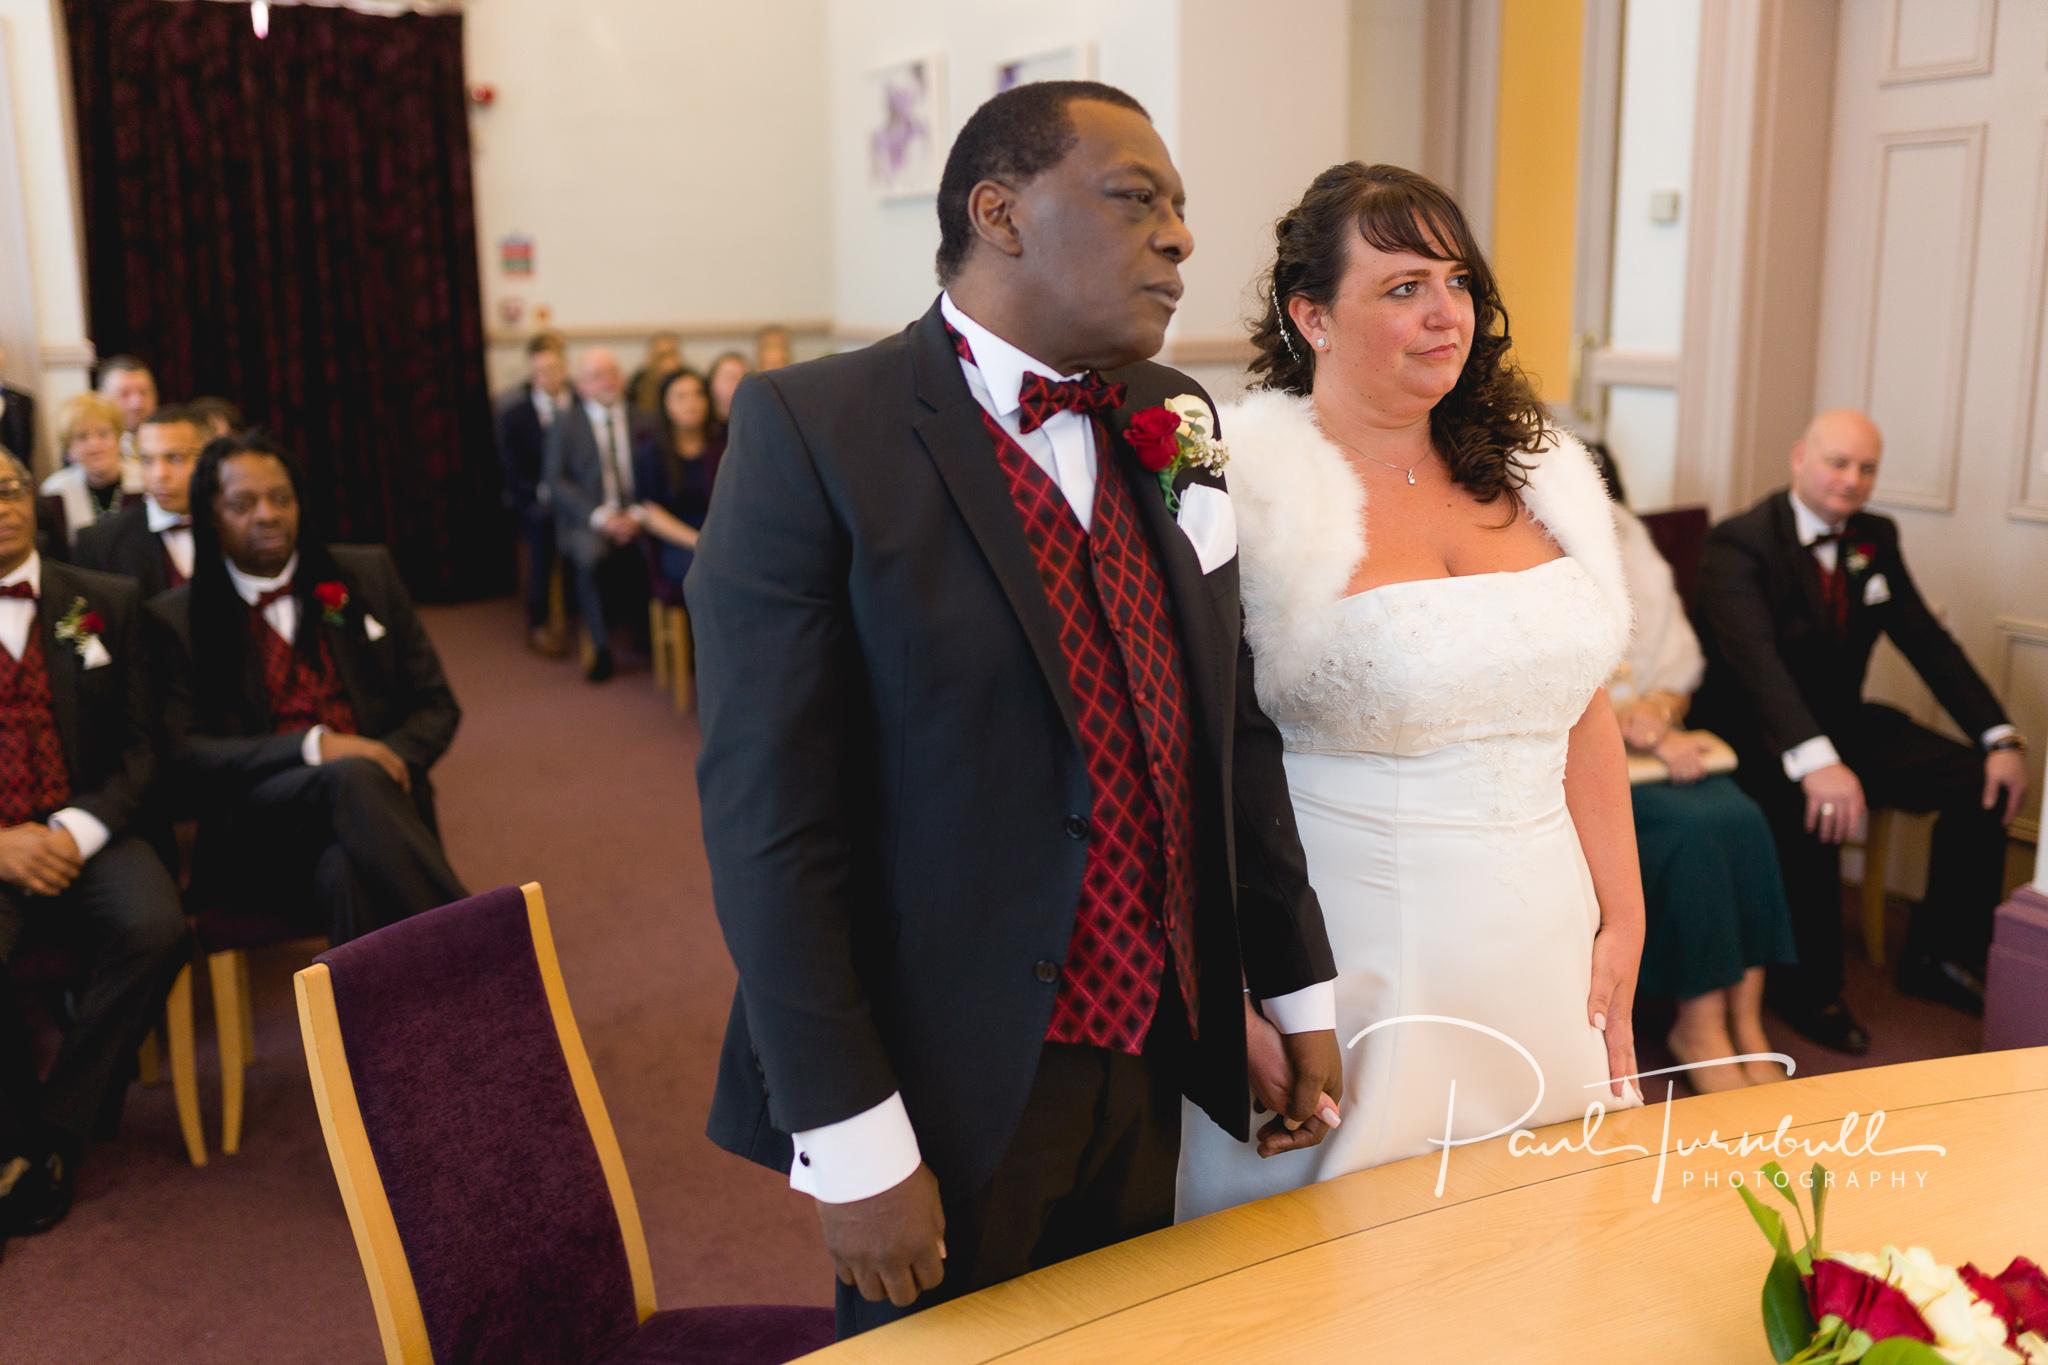 wedding-photographer-leeds-town-hall-023.jpg